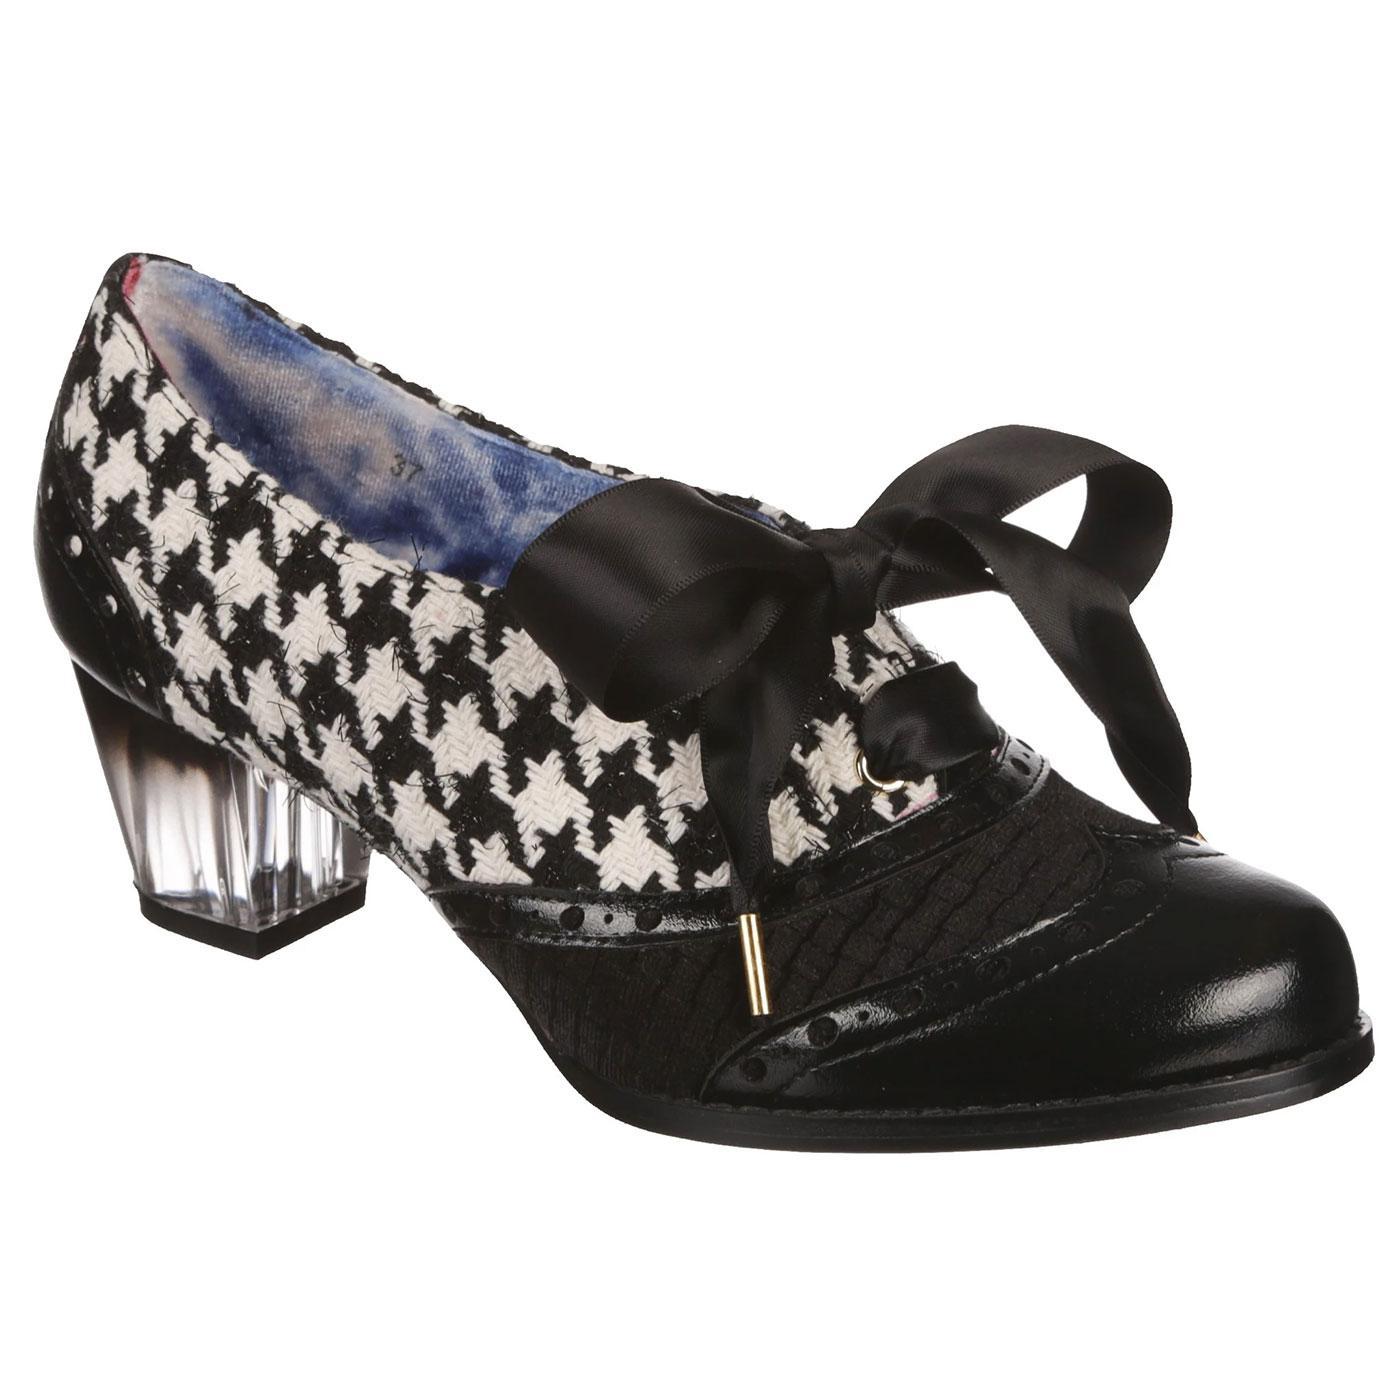 Corporate Beauty IRREGULAR CHOICE Retro Heels B/W